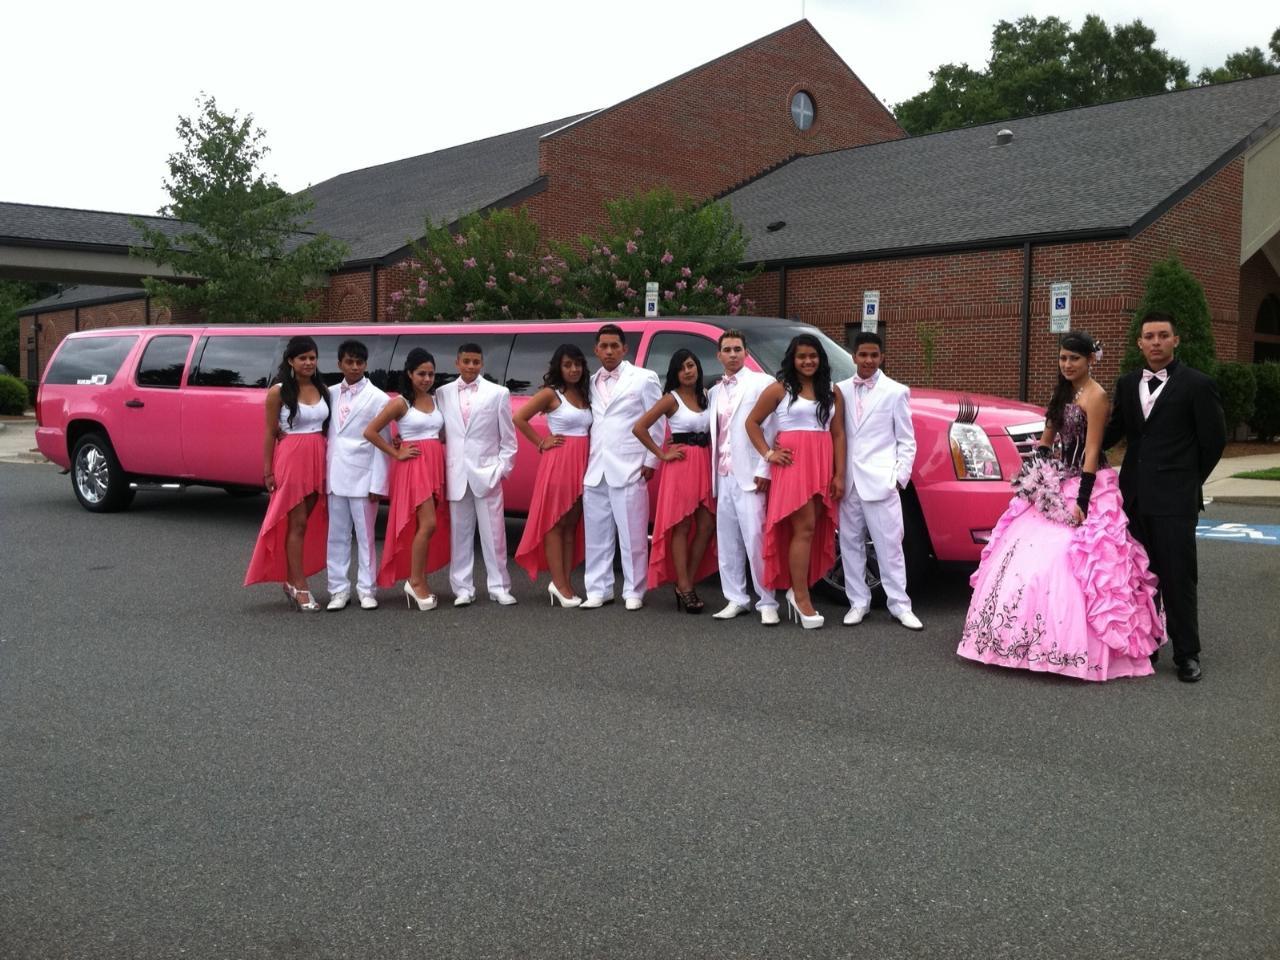 Pink Quincieanera Limo 2016